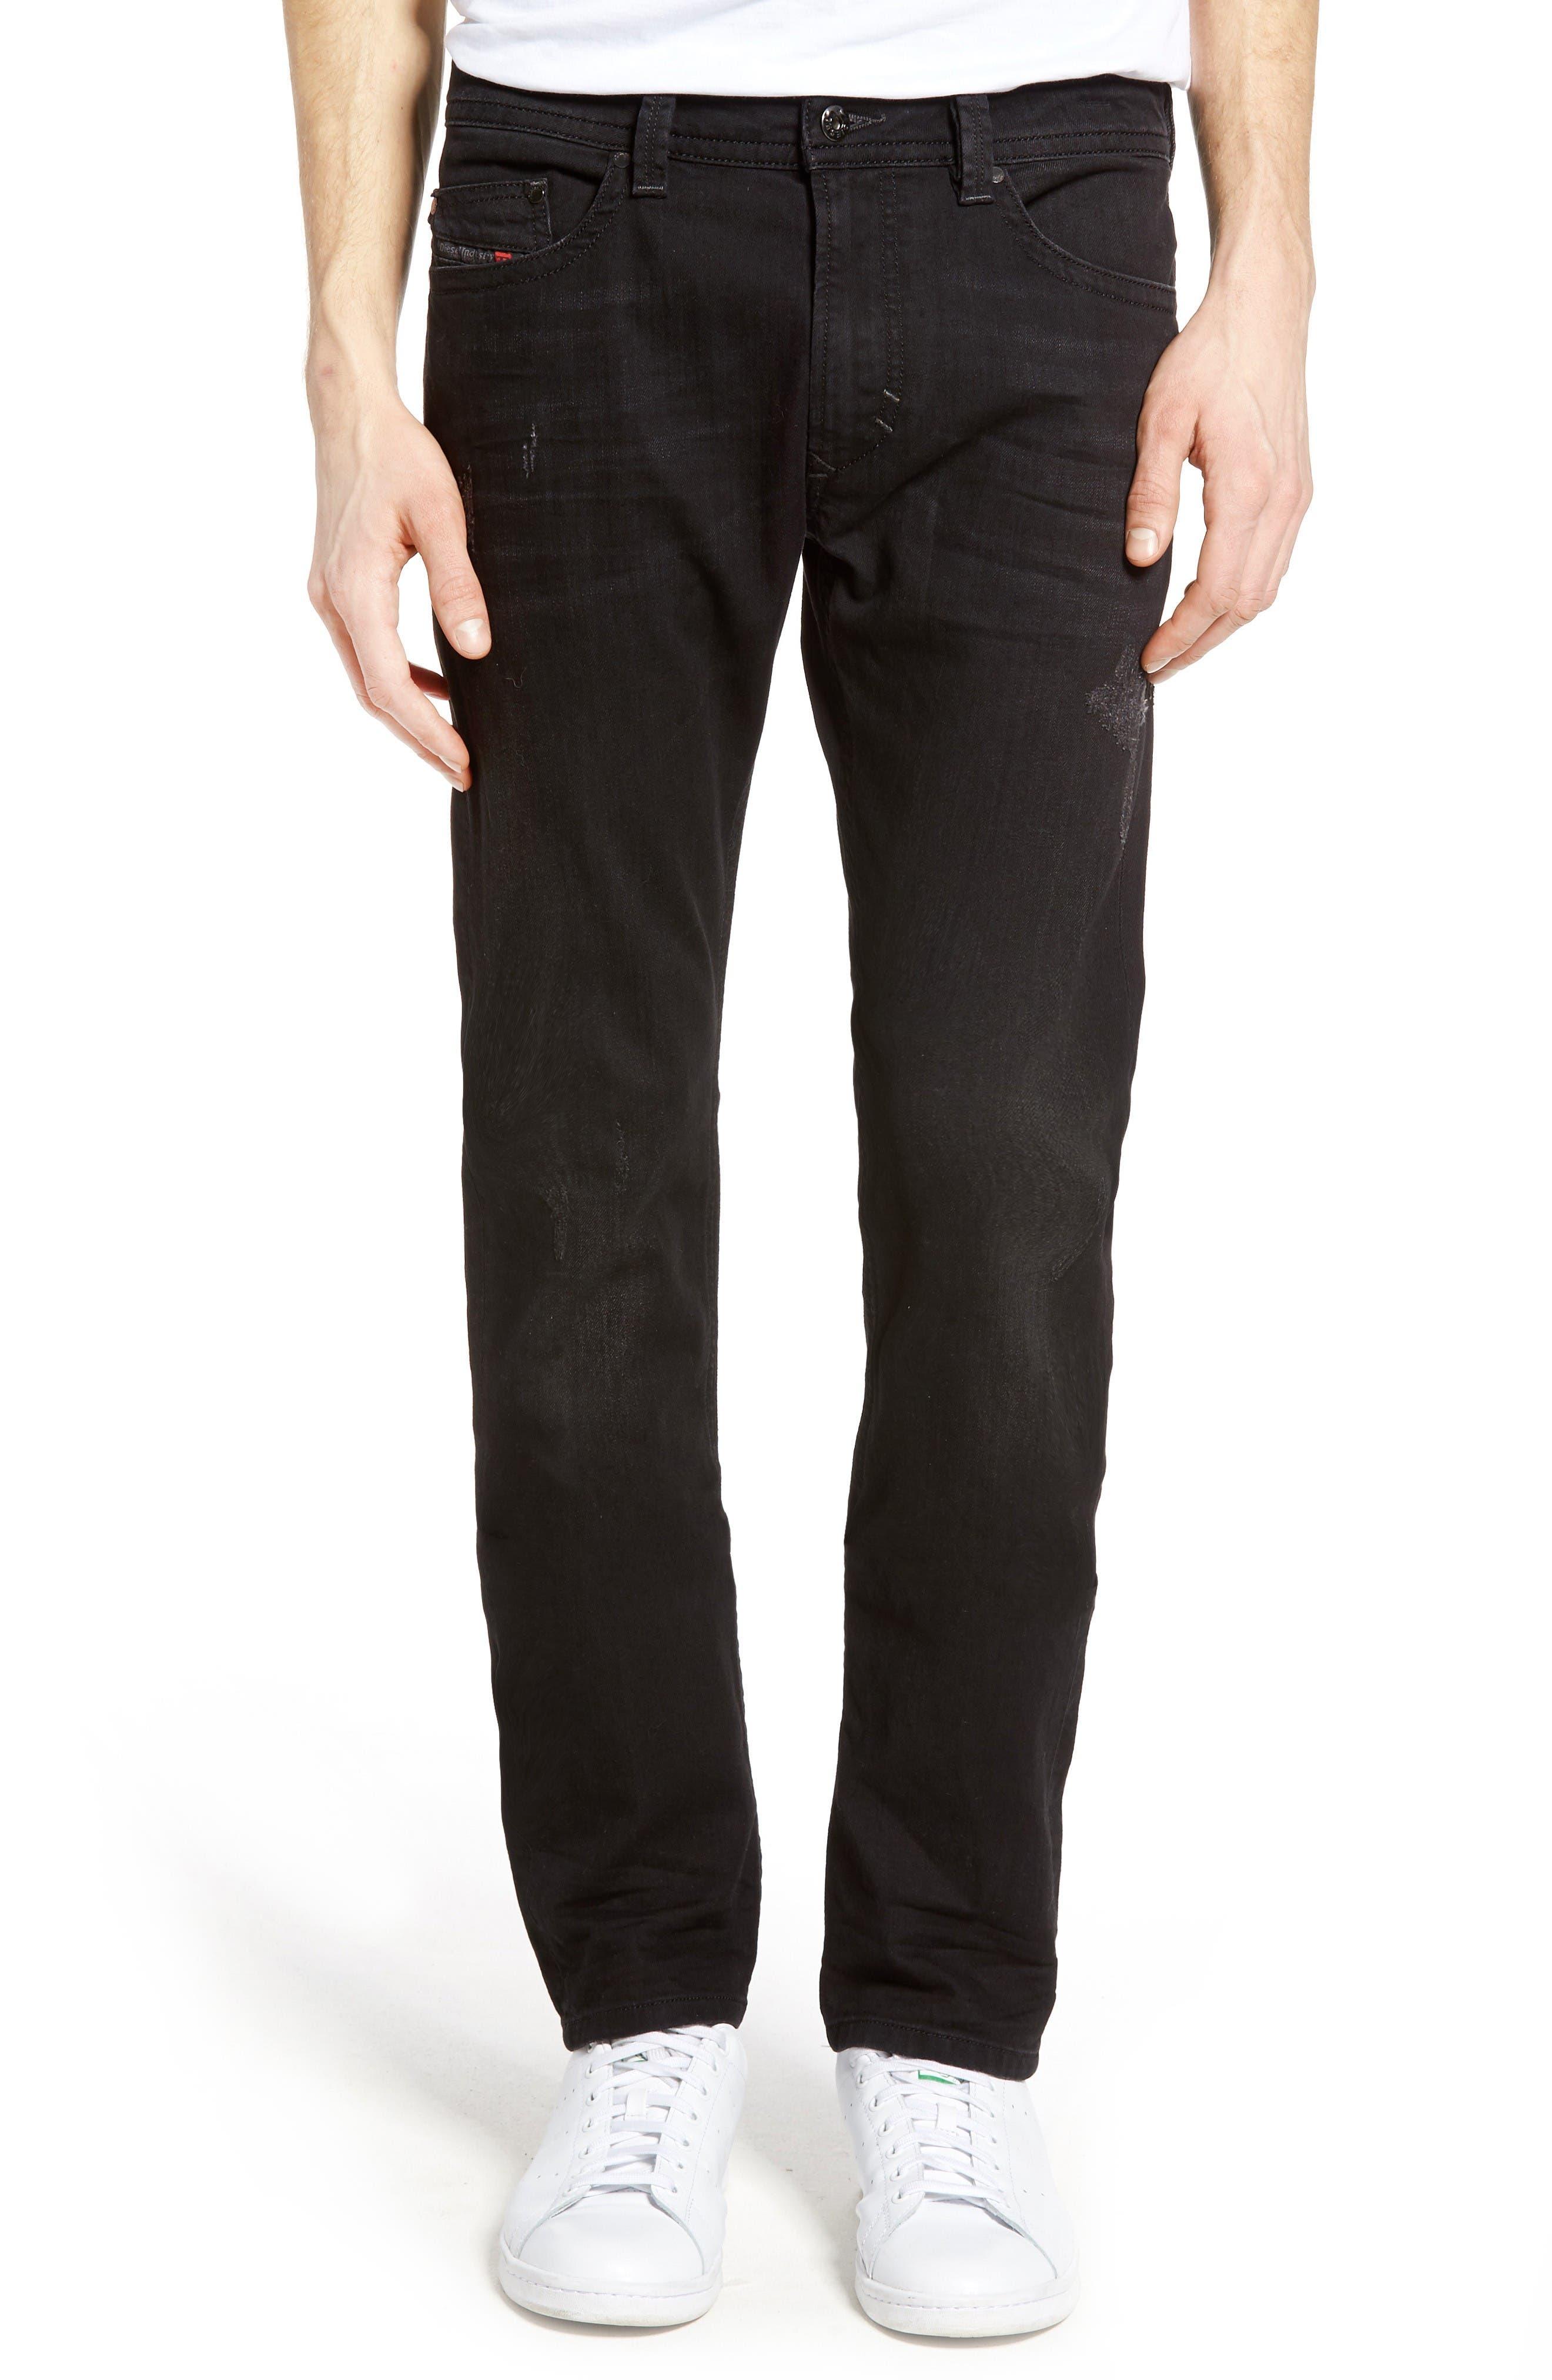 Alternate Image 1 Selected - DIESEL® Thavar Skinny Fit Jeans (0679F)